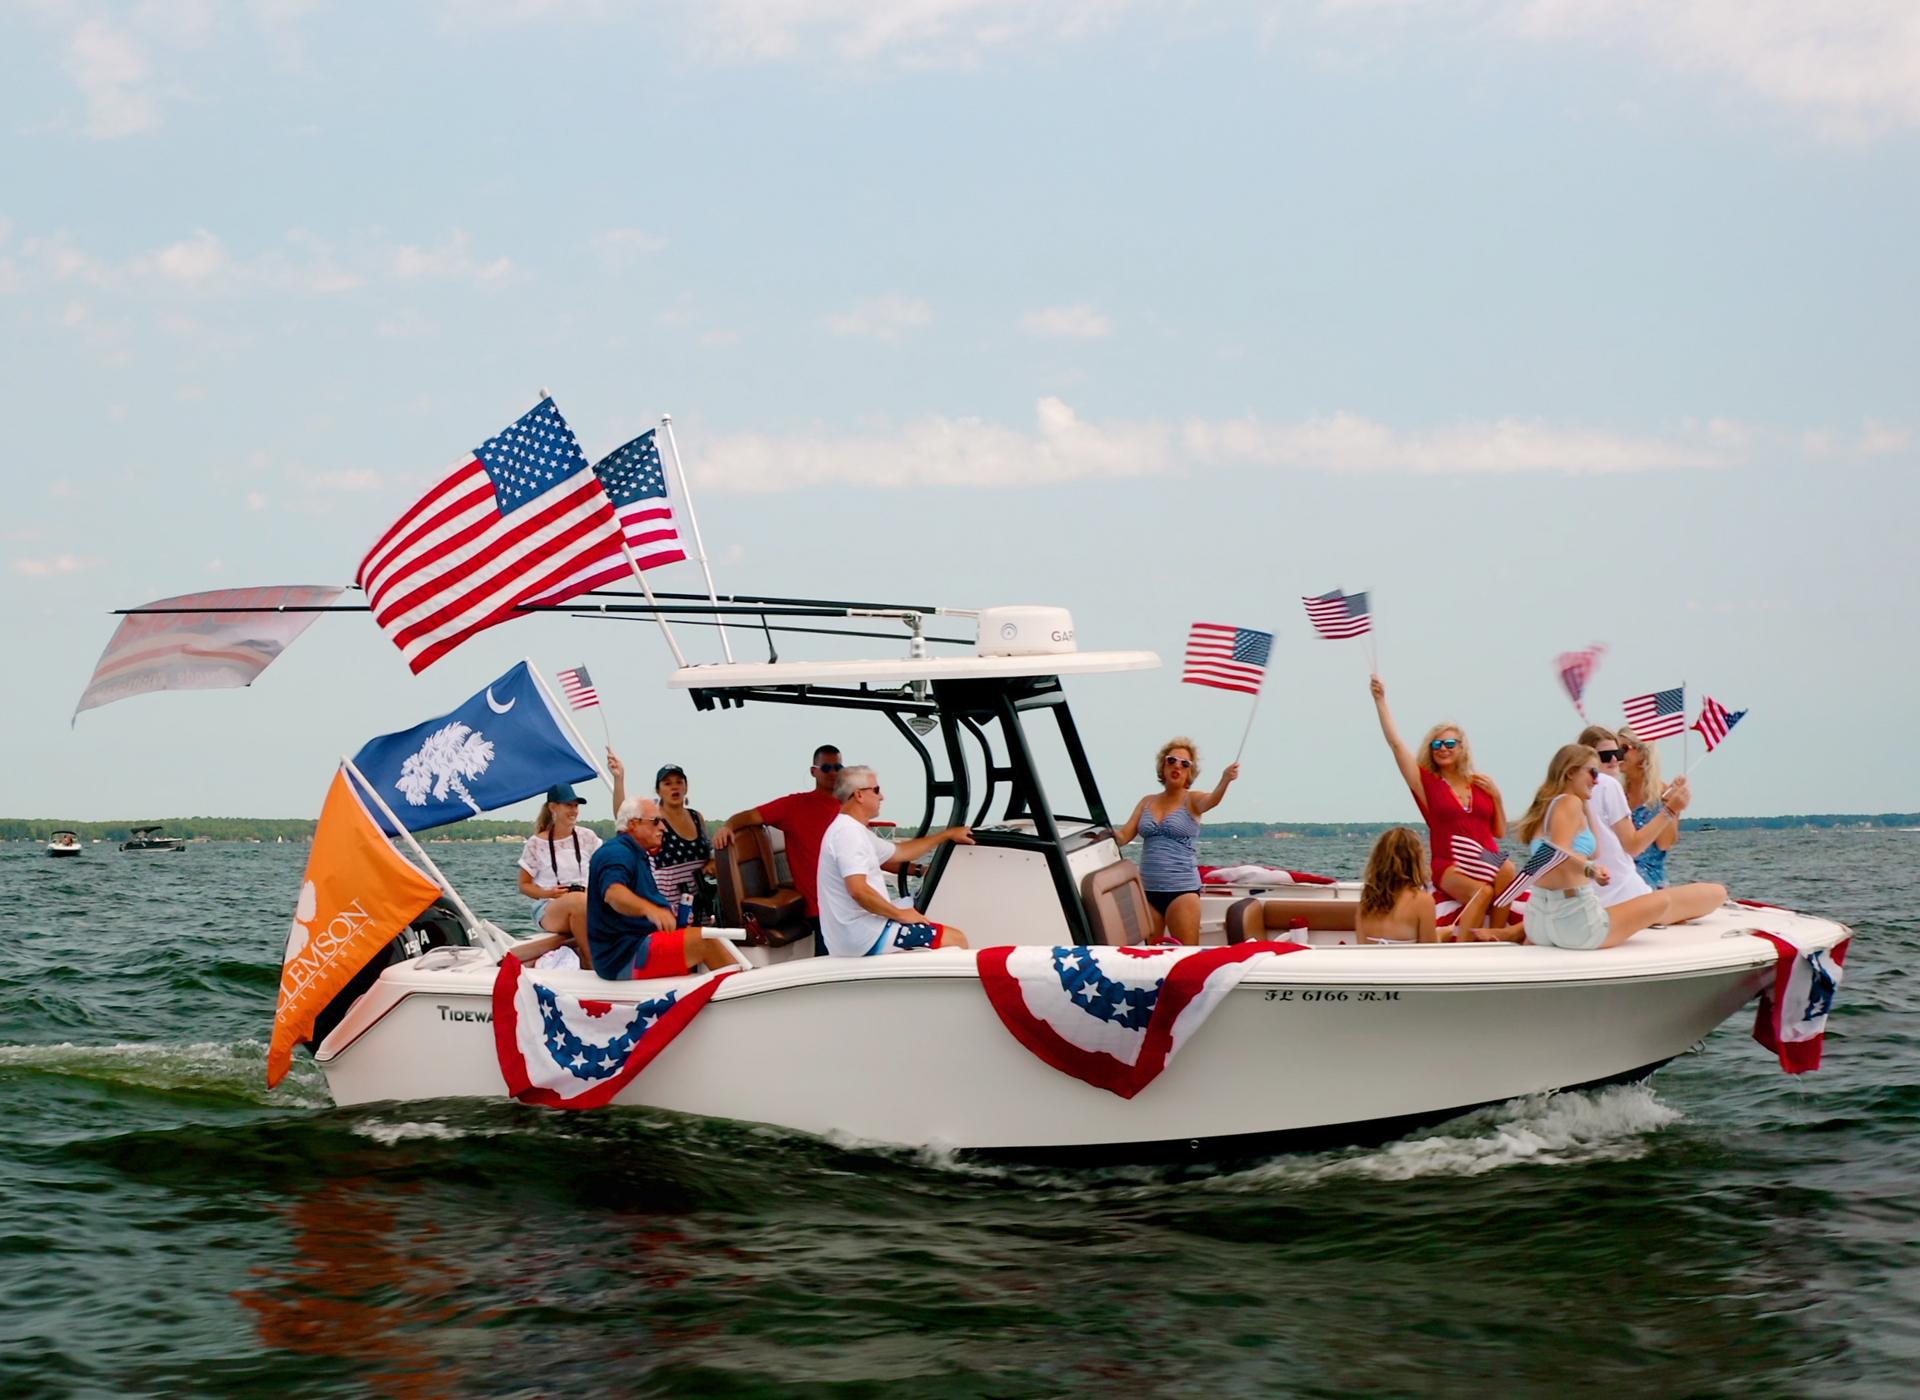 4th of July on Lake Murray, SC     Boat Parade